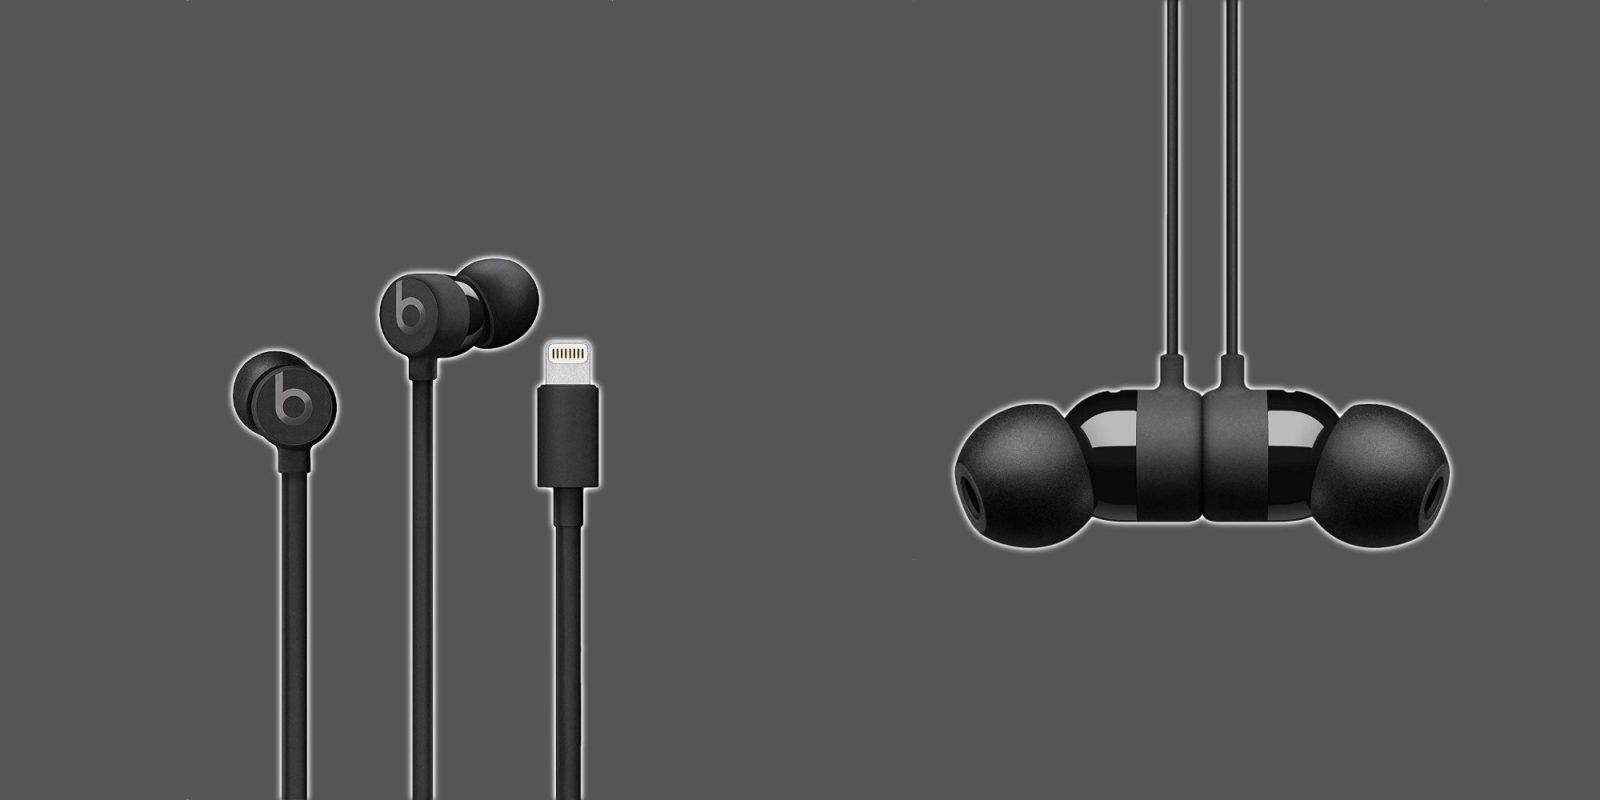 Apple's urBeats 3 Lightning Earphones are less than $42.50 at Amazon